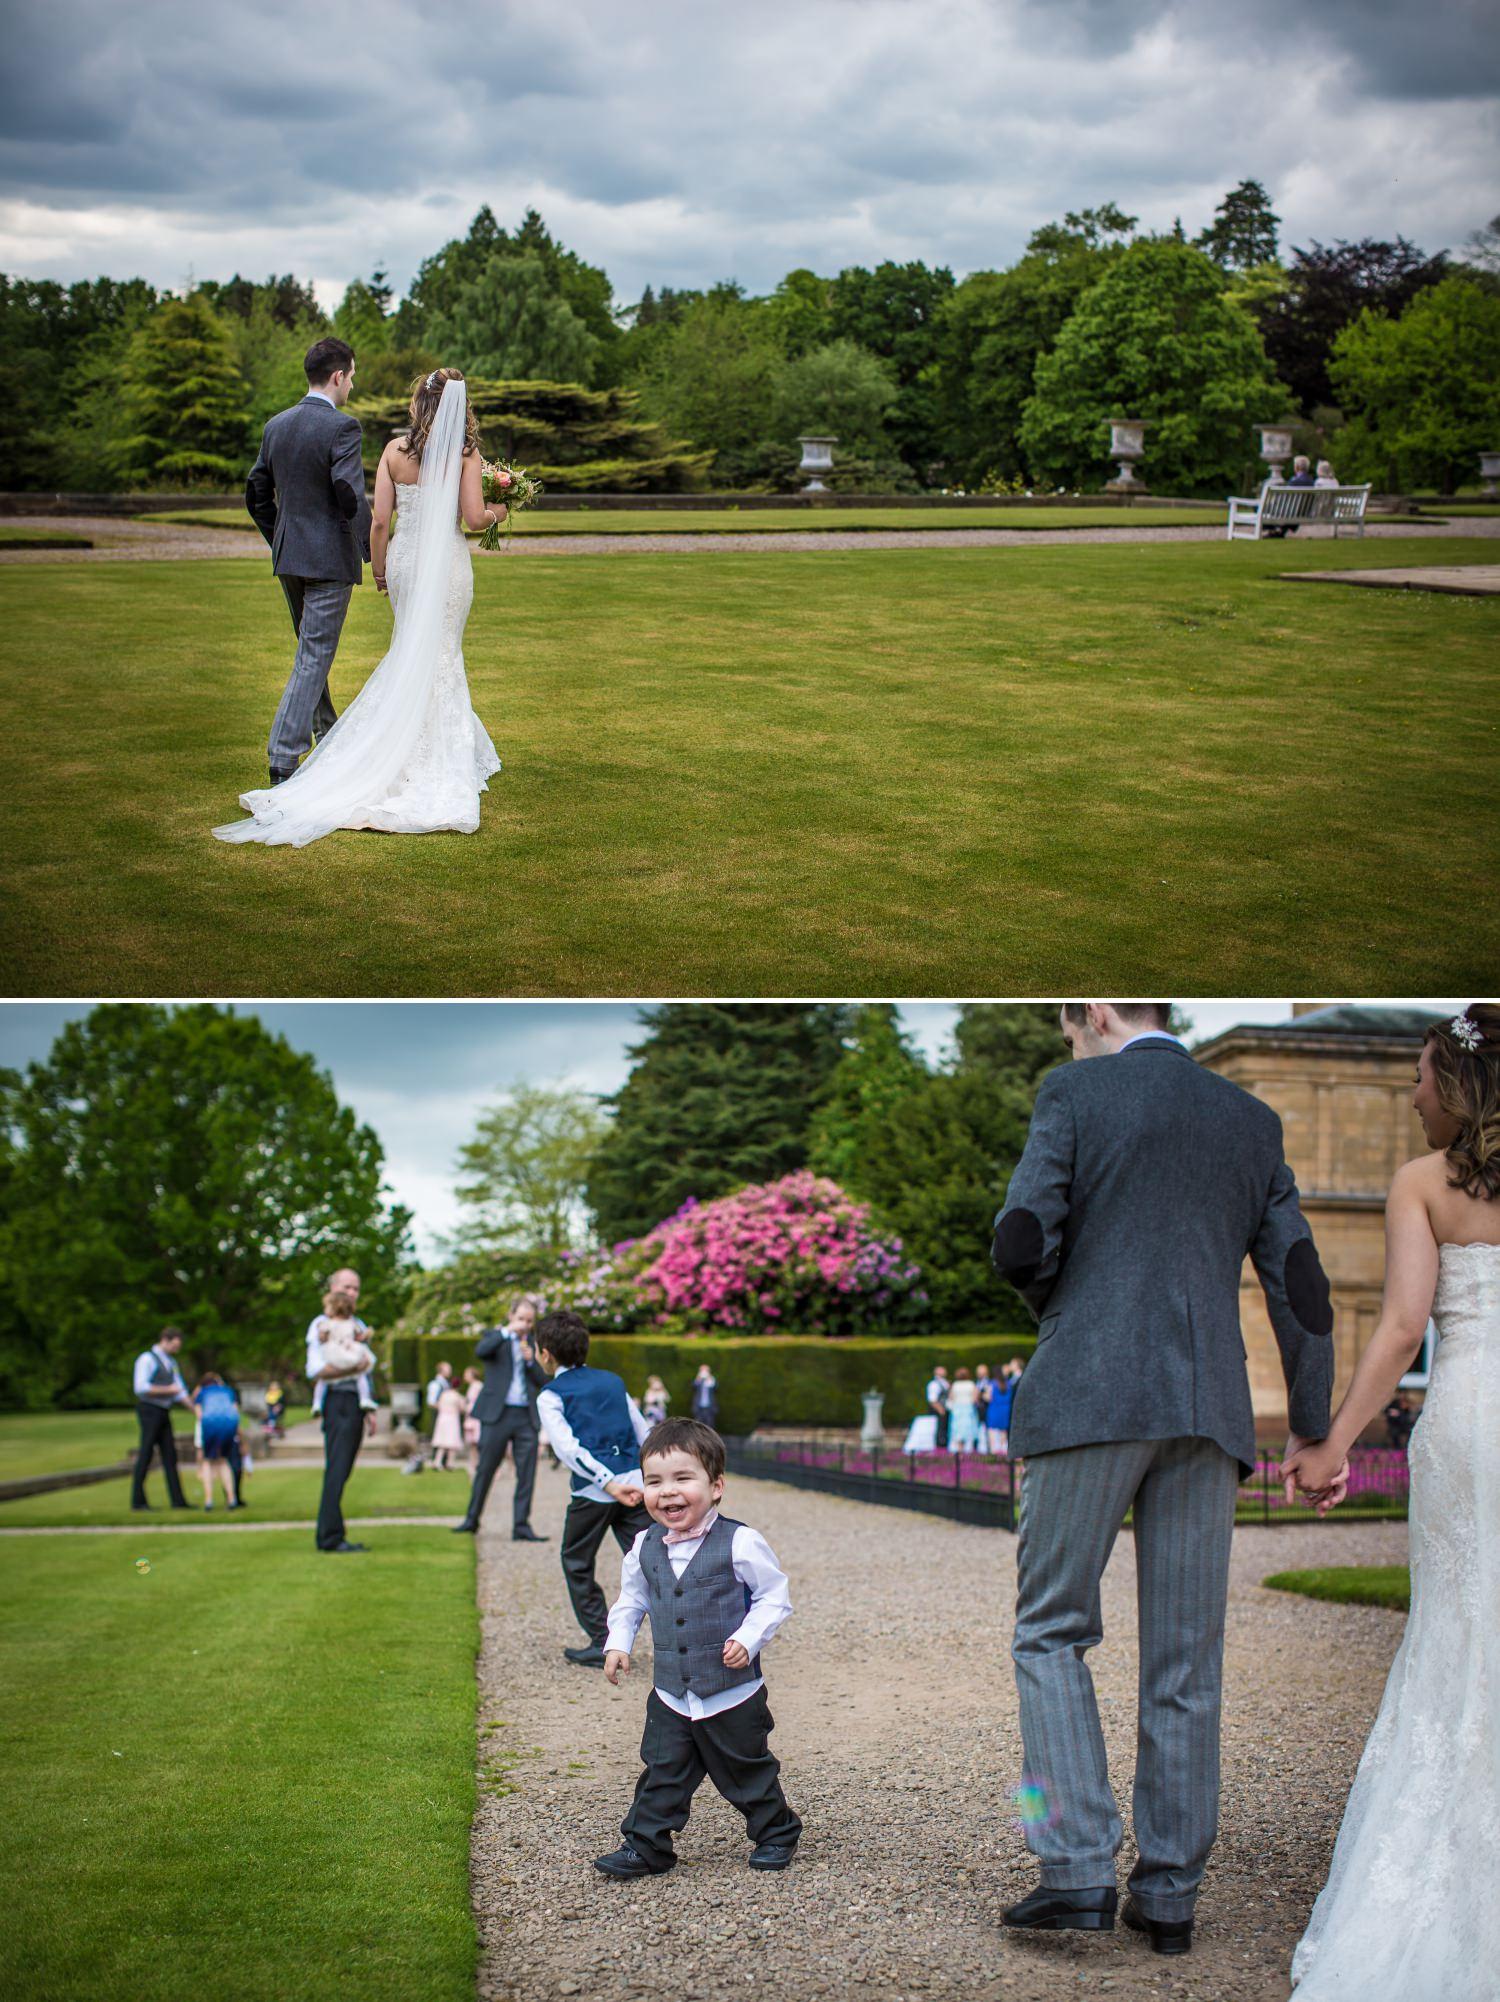 Guests having fun in professional wedding photograph taken at Tatton Park